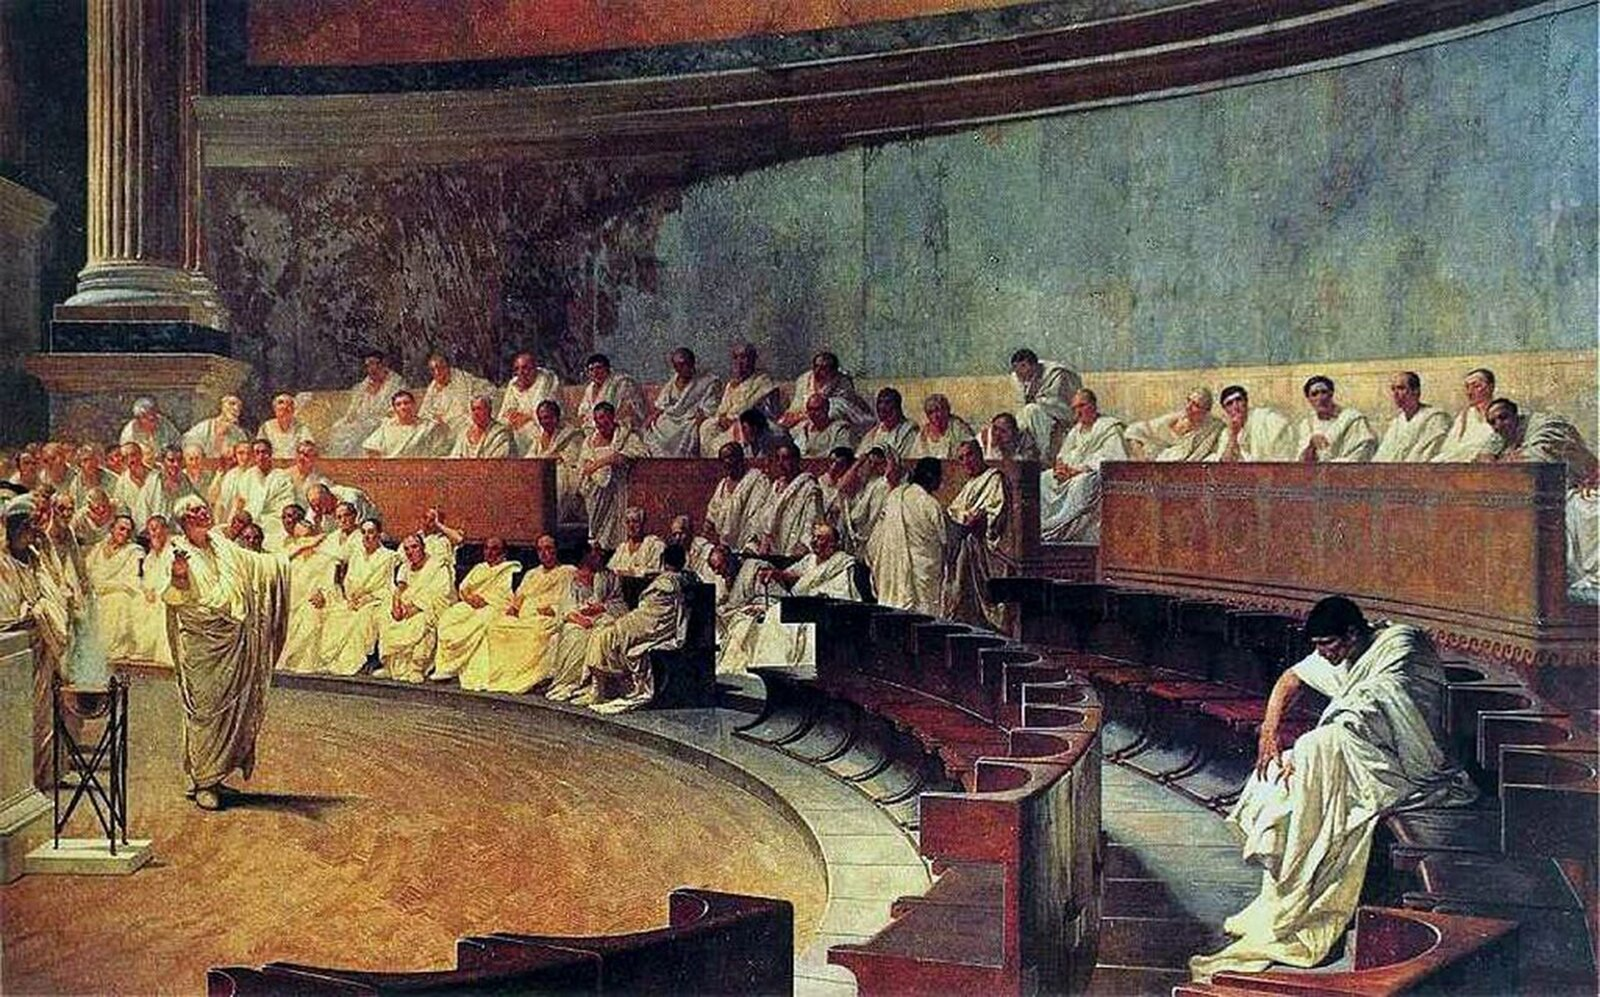 Cyceron oskarża Katylinę Źródło: Cesare Maccari, Cyceron oskarża Katylinę, domena publiczna.